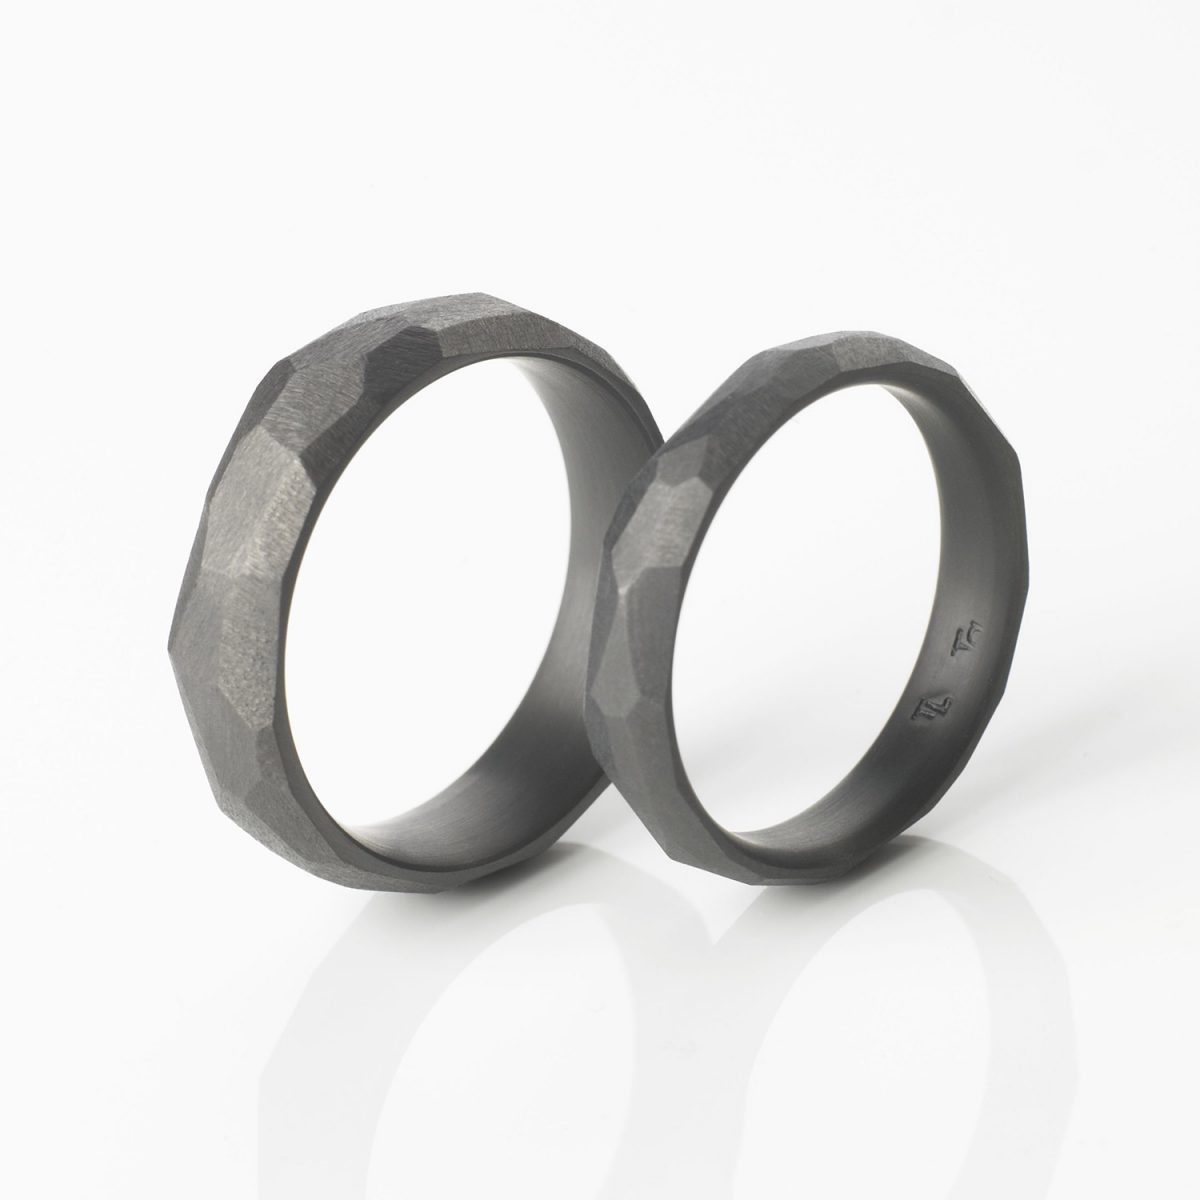 Tantal Eheringe | Hochzeitsringe | Ringpaar True Love Collection No:36